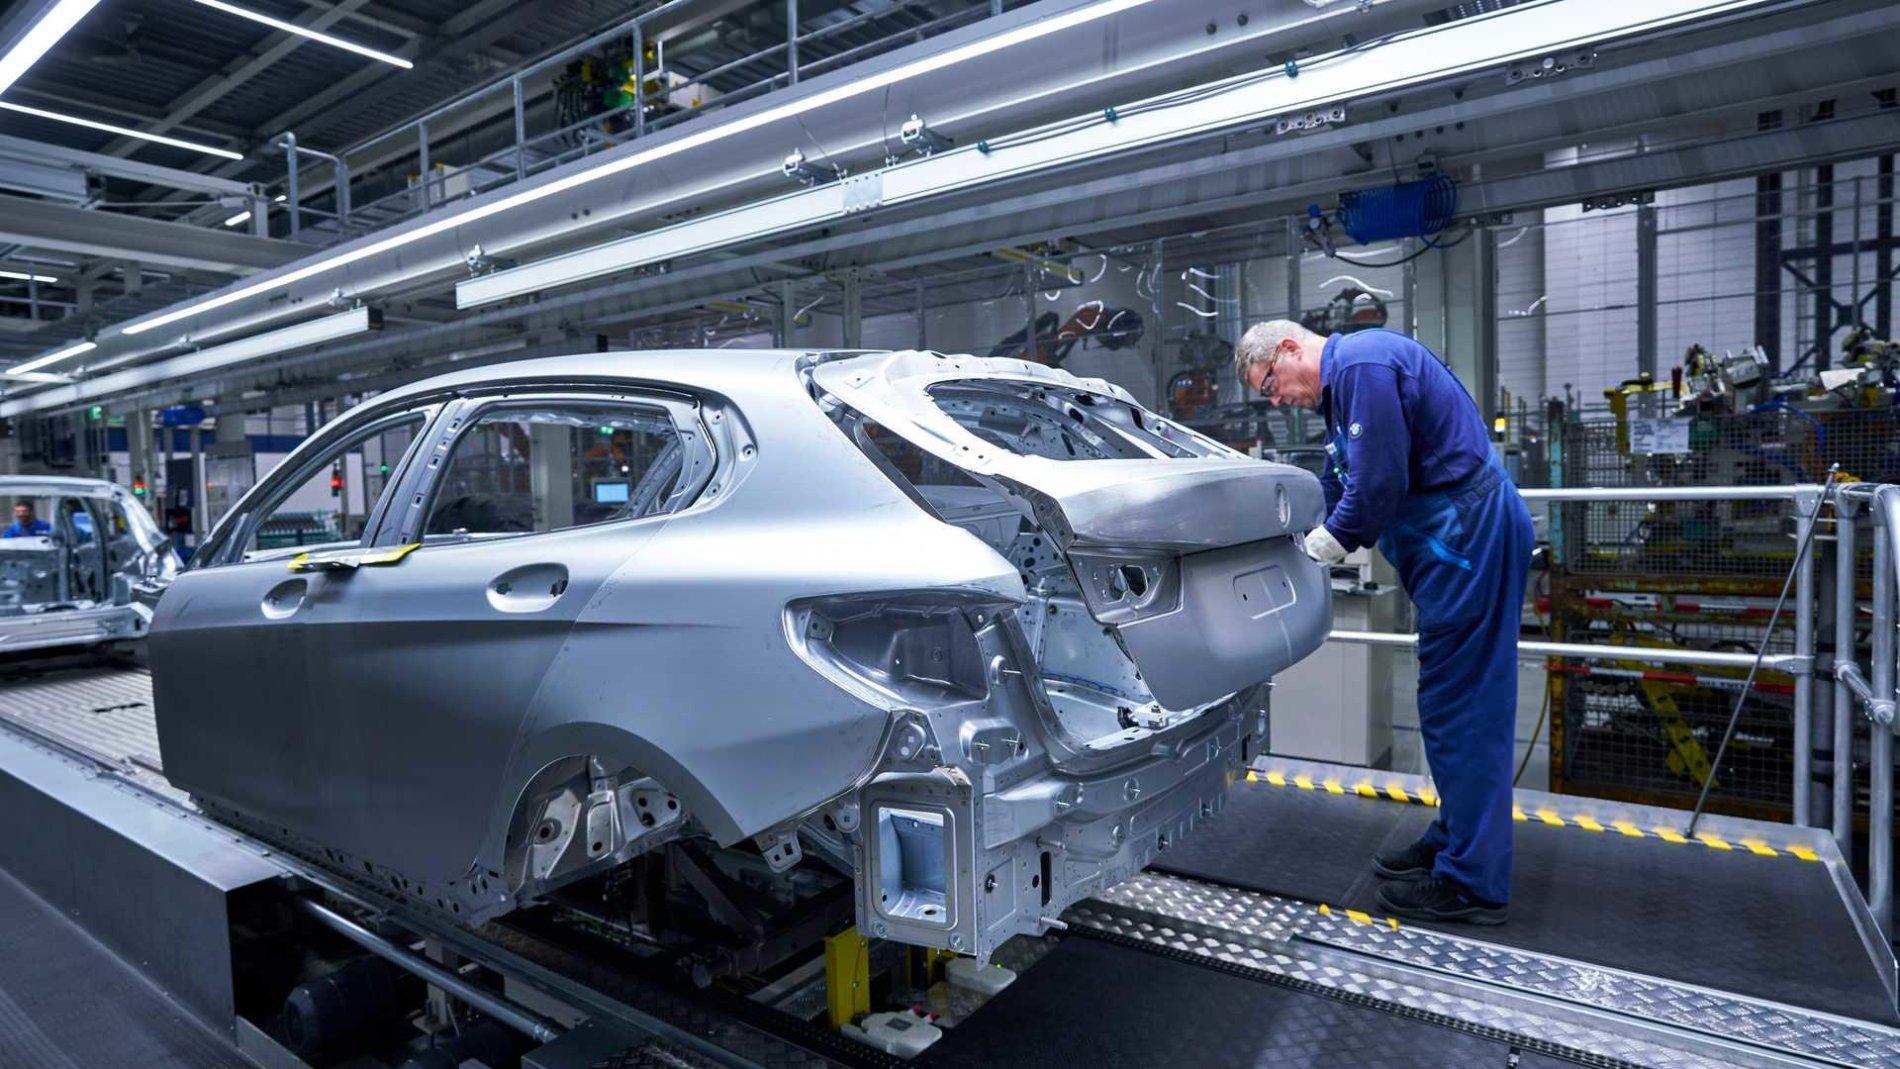 BMW Seria 1 - Poze de pe linia de productie - BMW Seria 1 - Poze de pe linia de productie